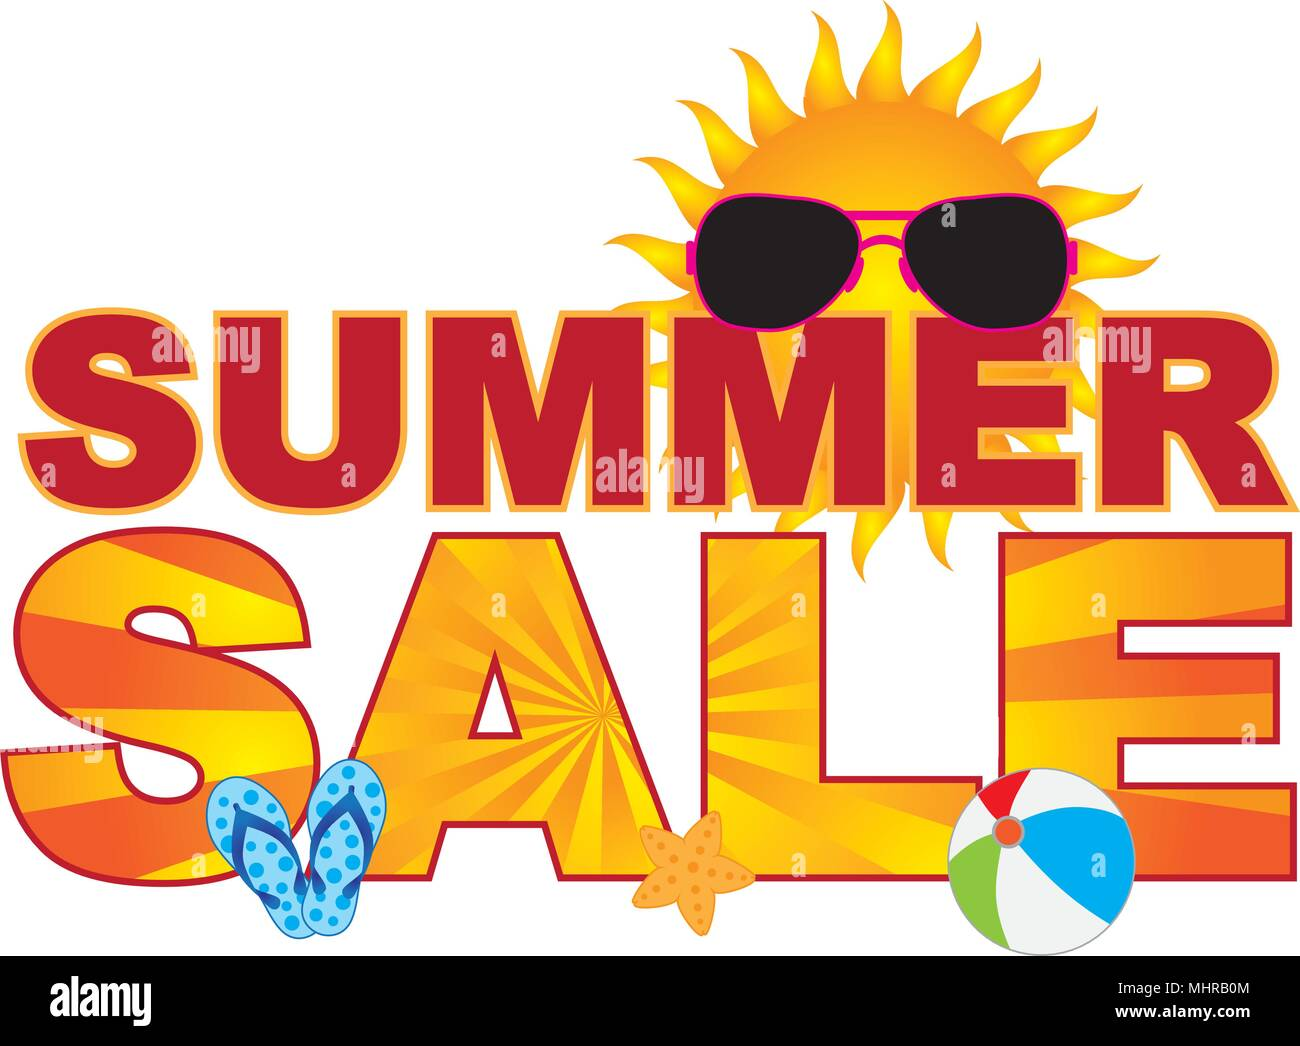 827b80307d4c Summer Sale retail store sign banner with sunglasses flip-flop beach ball  sun illustration -